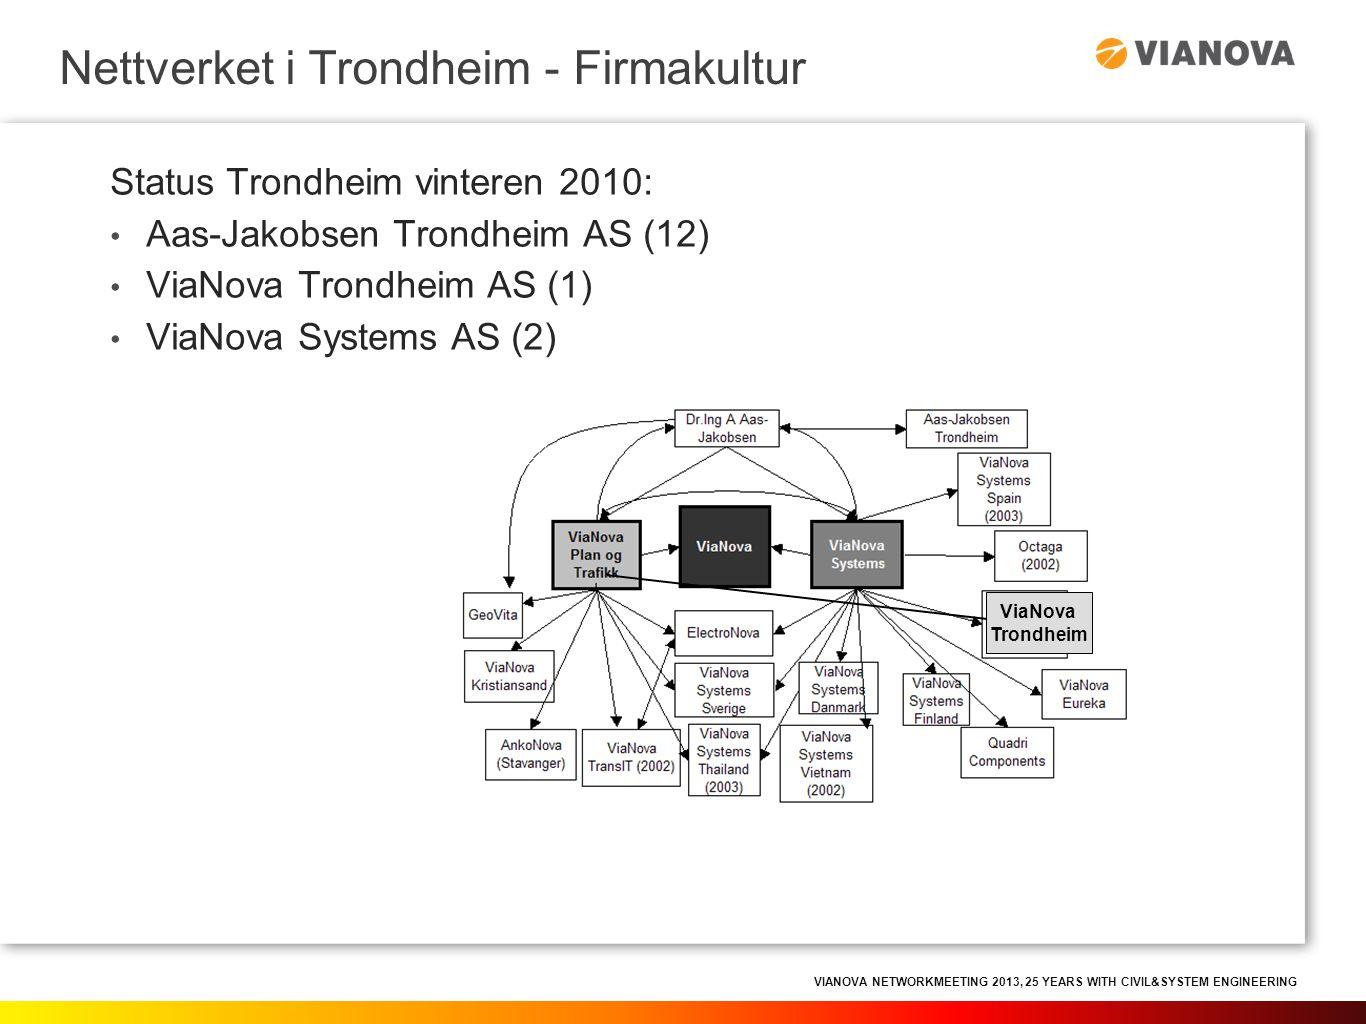 VIANOVA NETWORKMEETING 2013, 25 YEARS WITH CIVIL&SYSTEM ENGINEERING Nettverket i Trondheim - Firmakultur Dette må unngås: